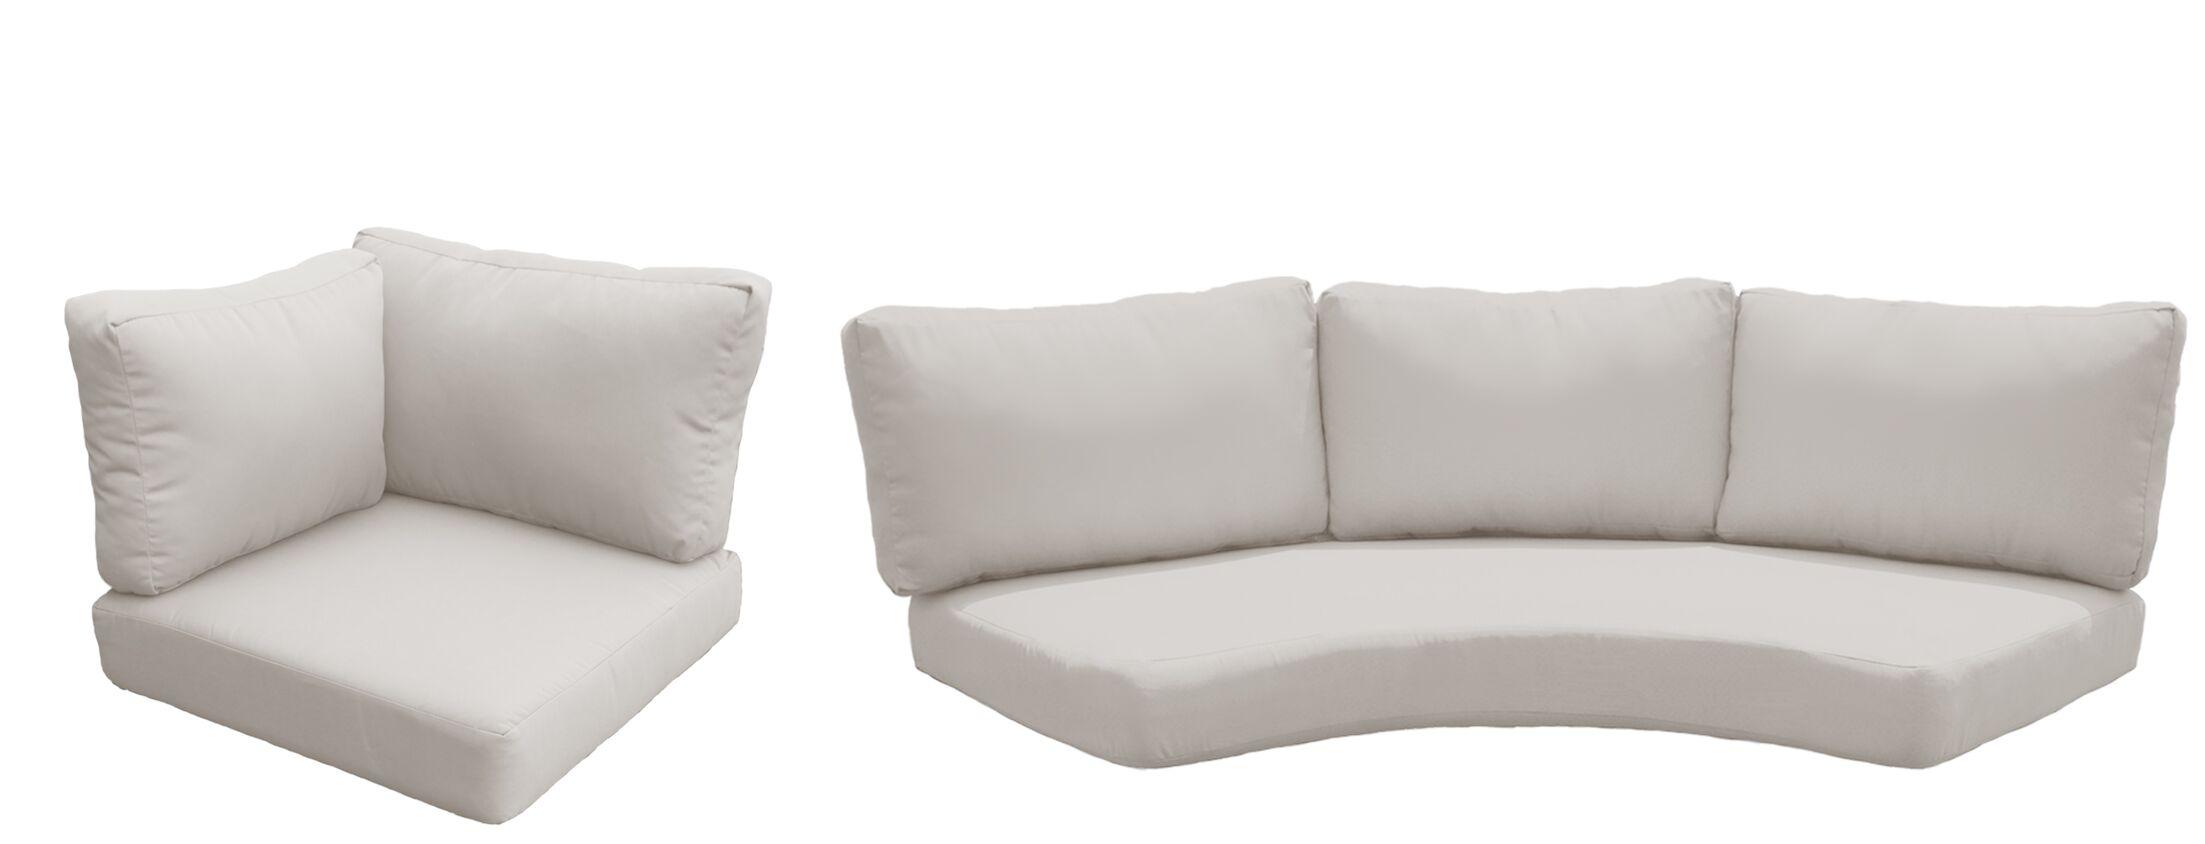 East Village 10 Piece Outdoor Cushion Set Fabric: Beige